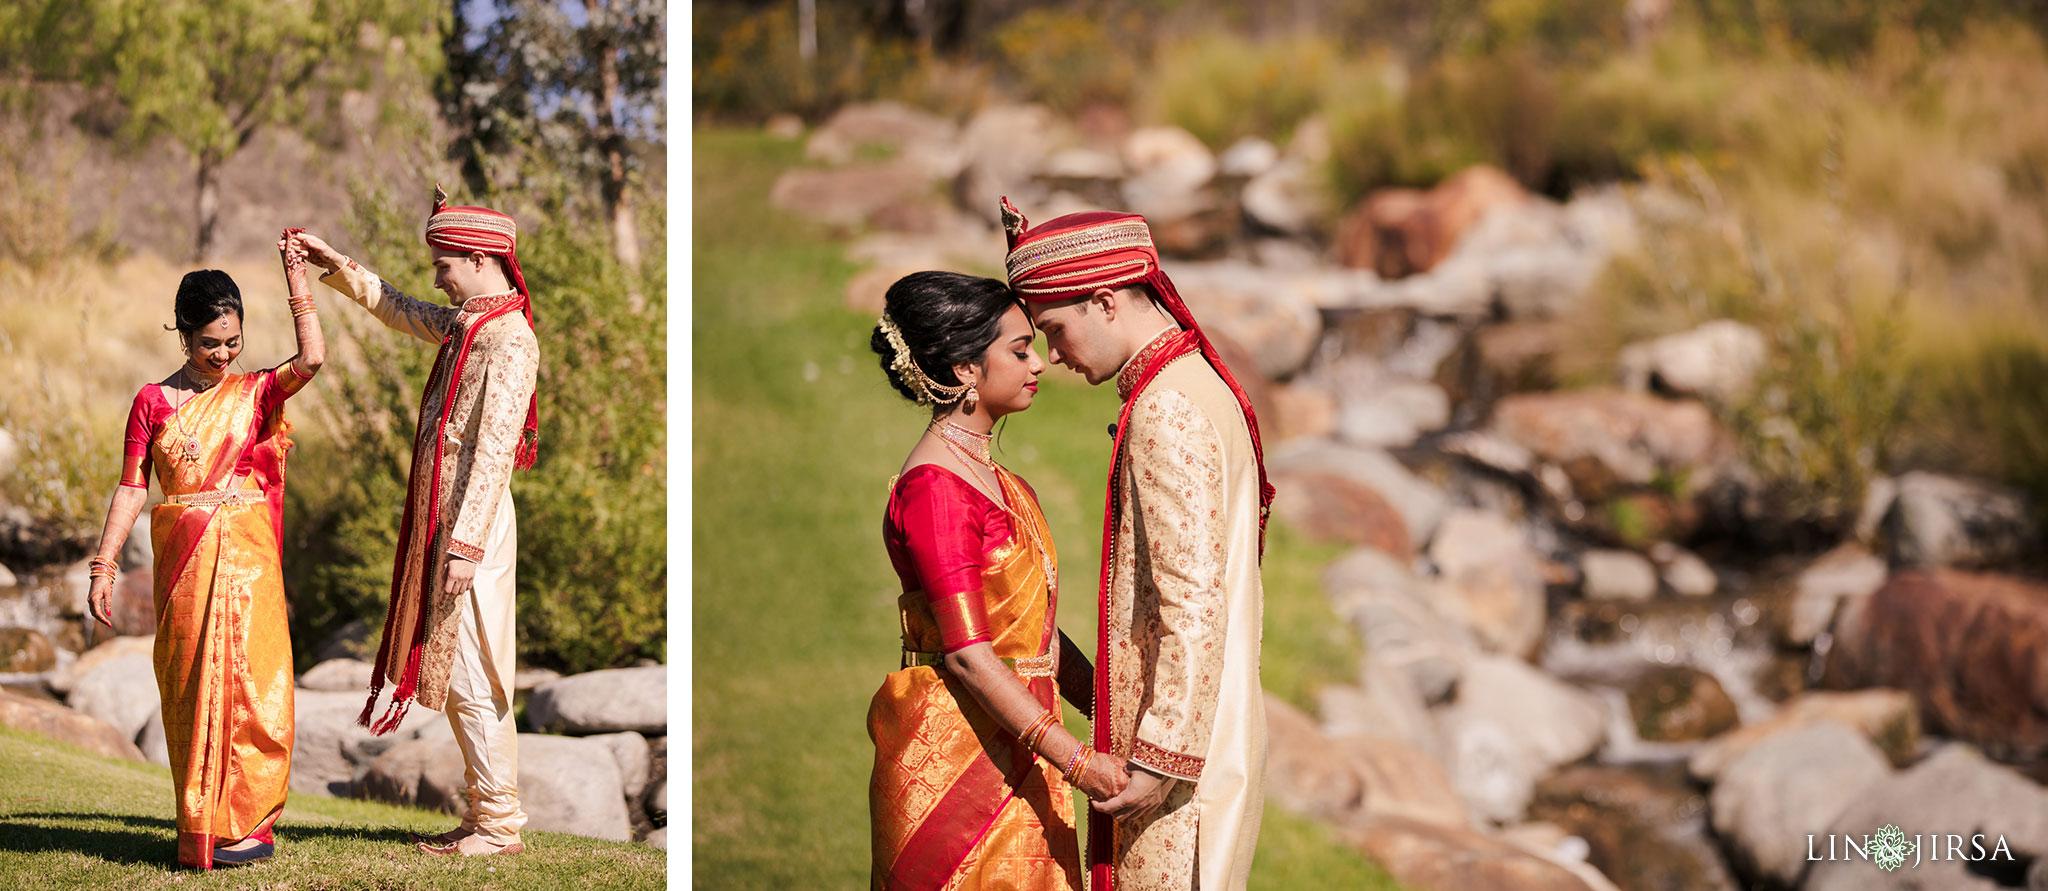 07 Black Gold Golf Course Yorba Linda Indian Wedding Photography